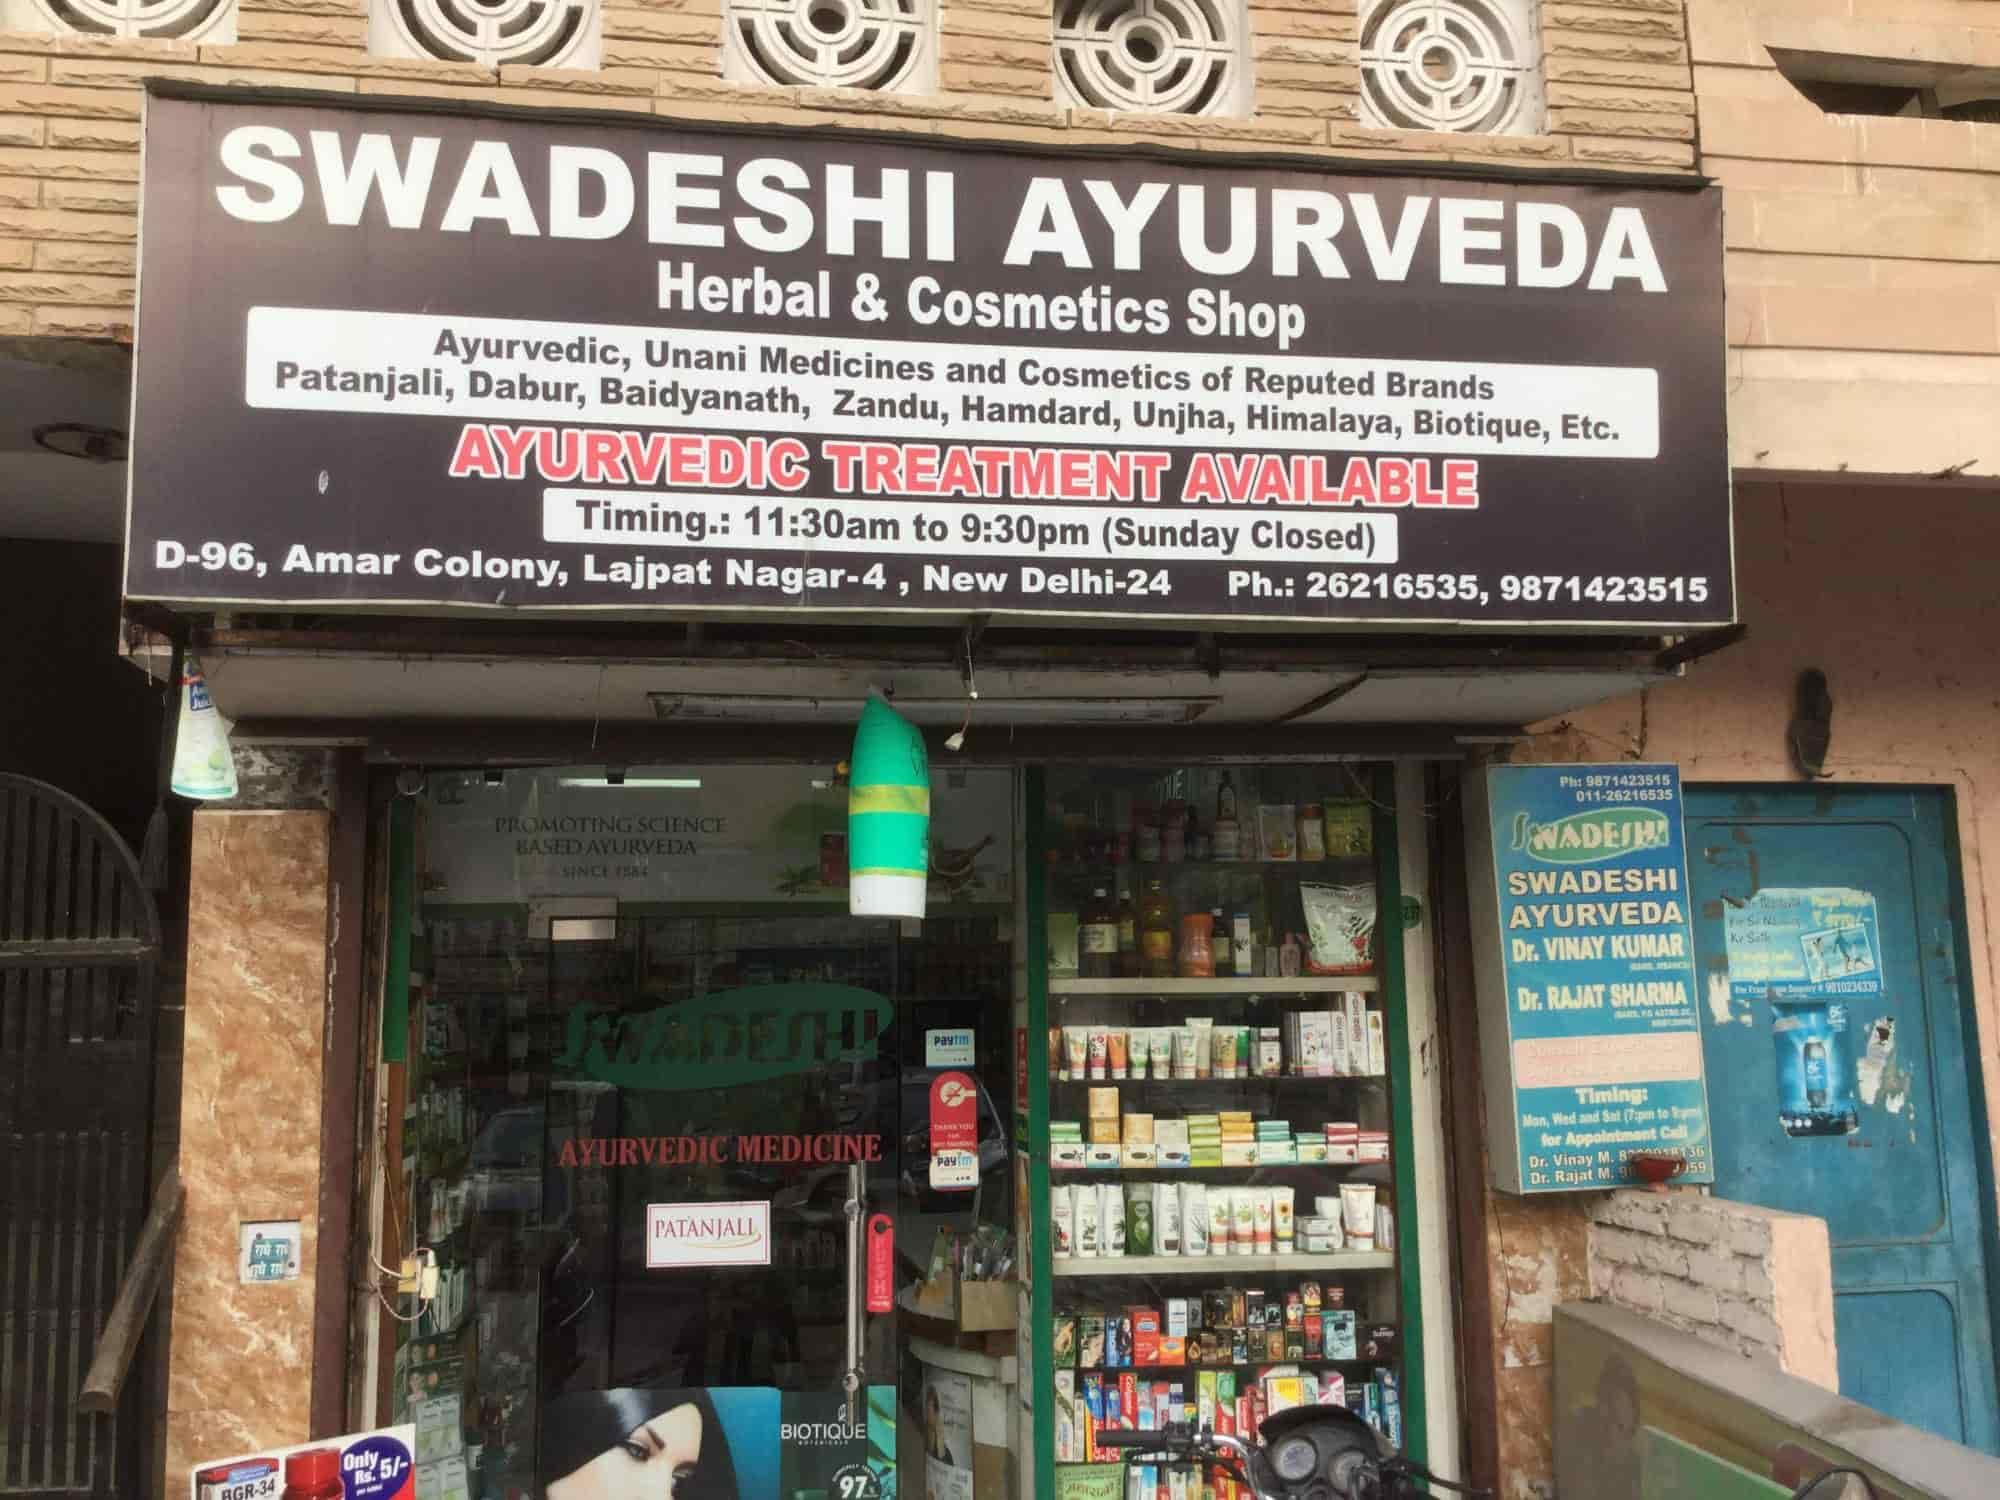 Swadeshi Ayurveda Amar Colony Lajpat Nagar